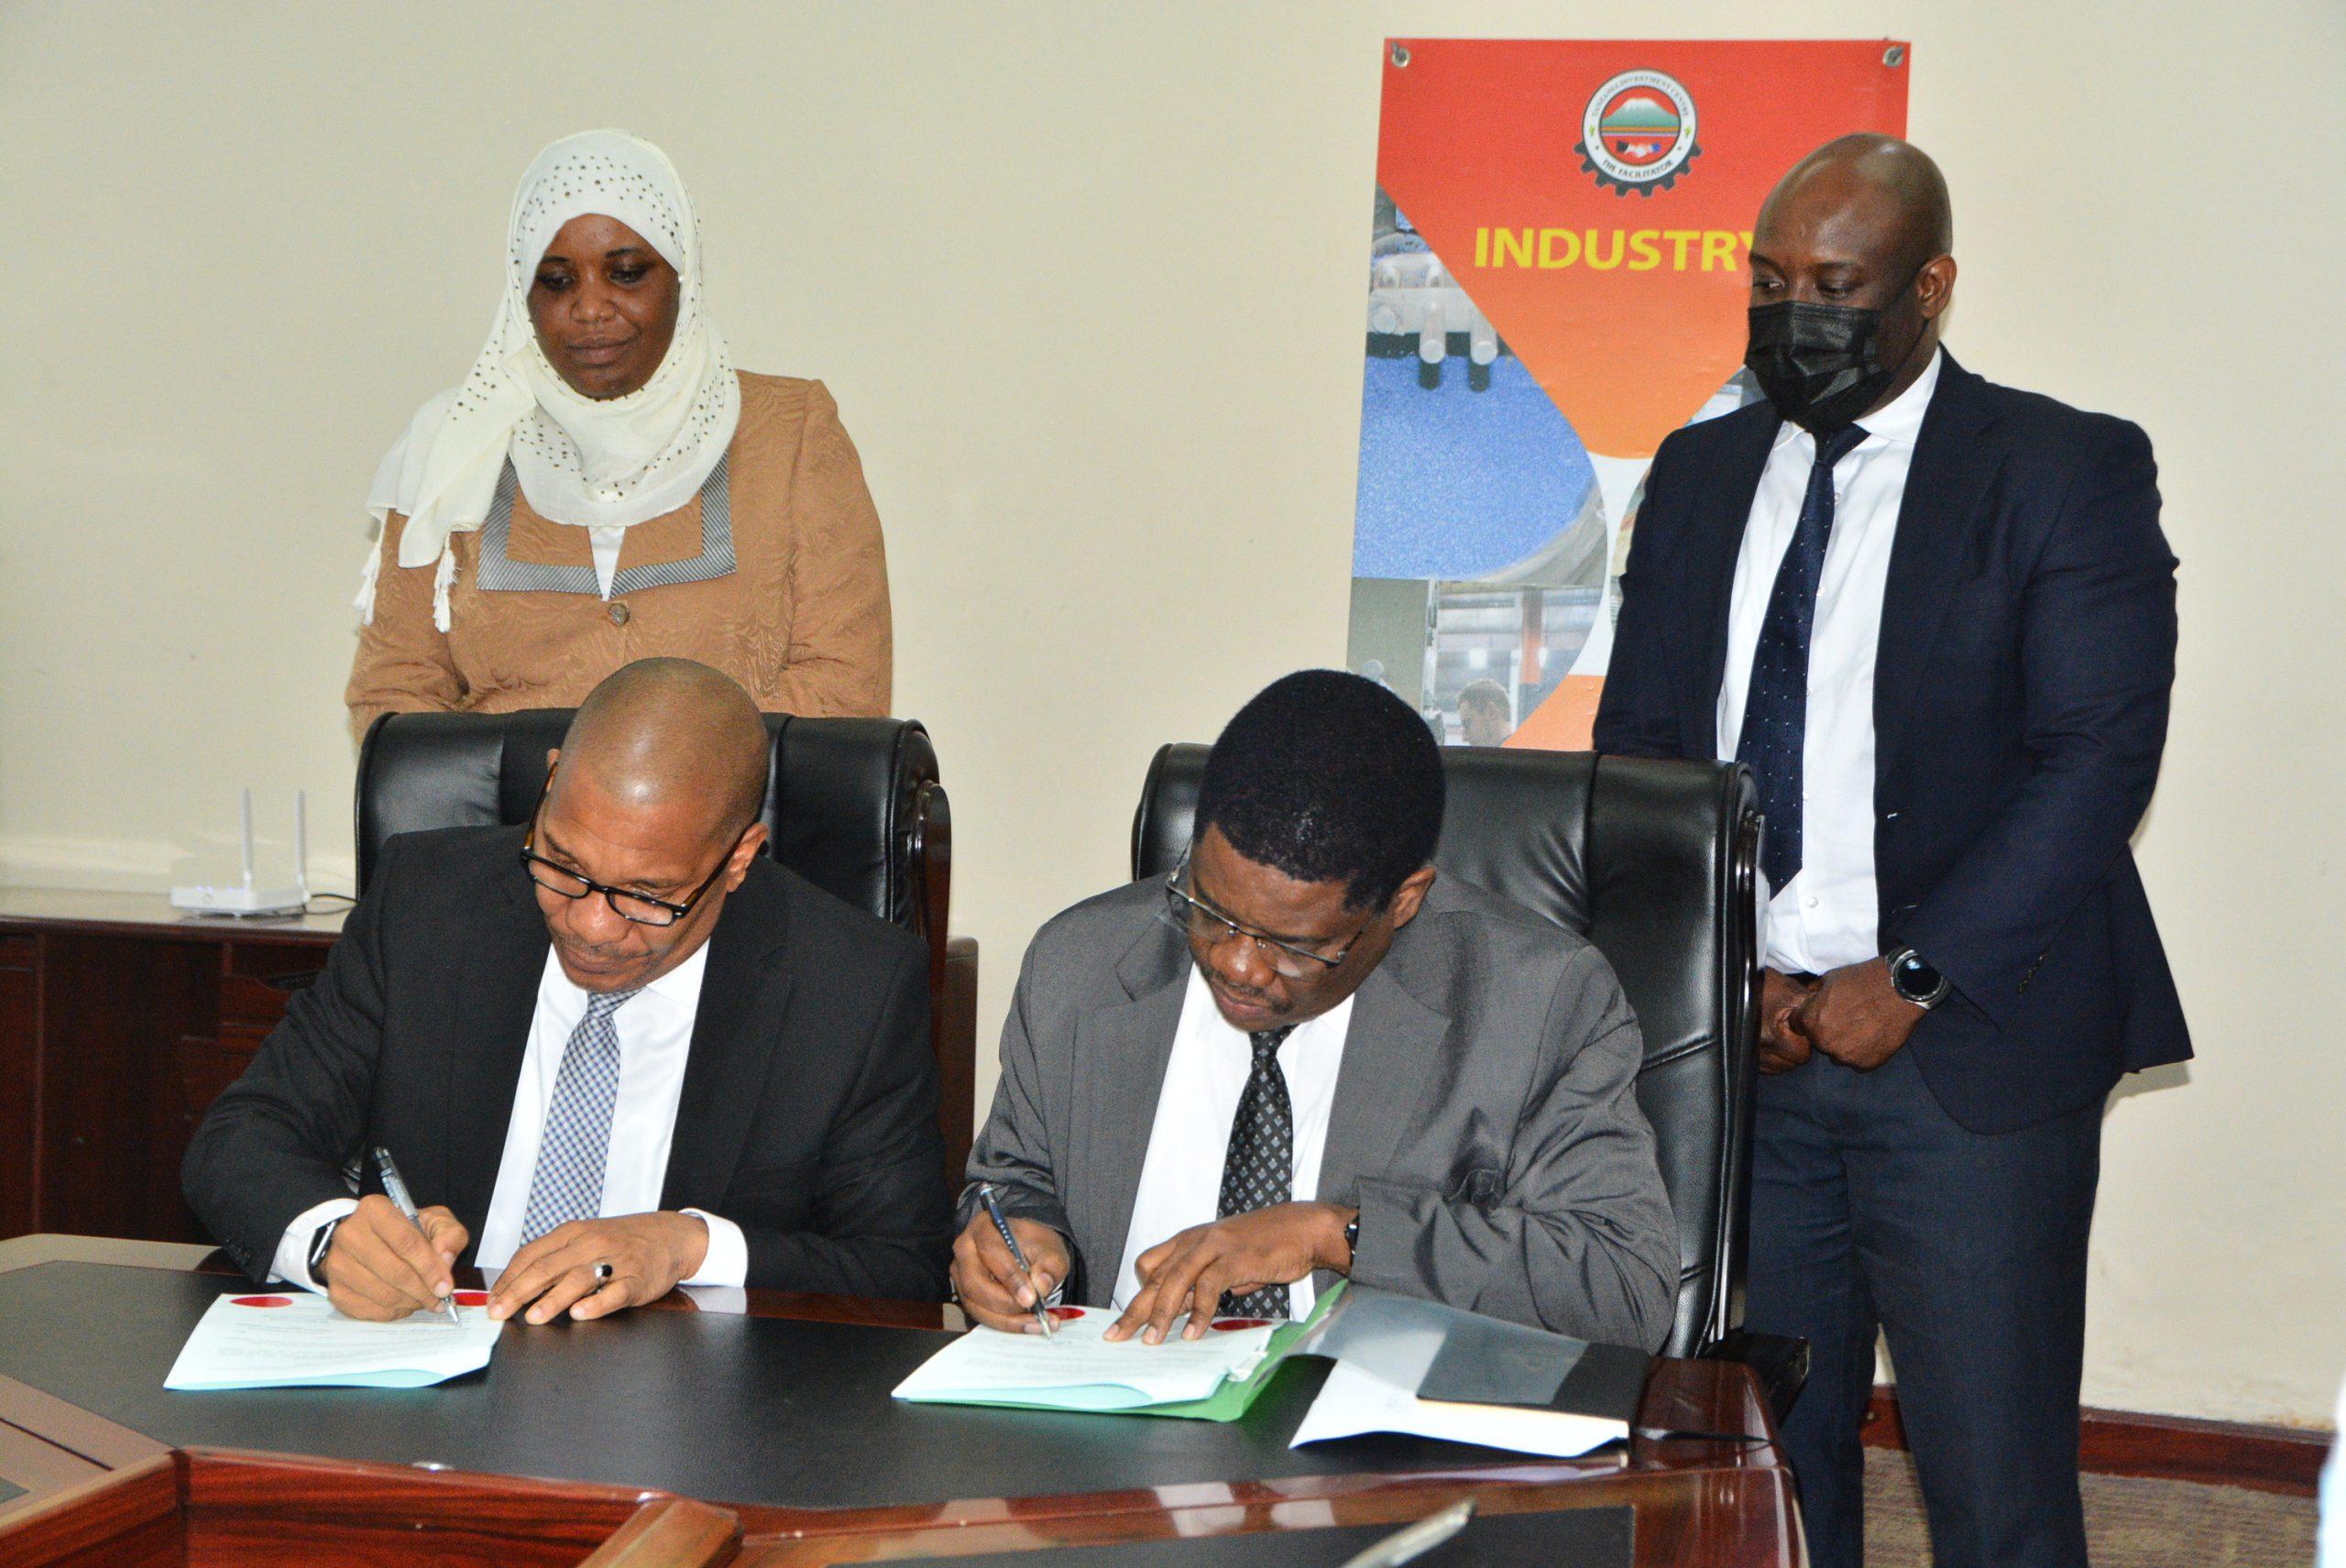 Zanzibar Investment Promotion Authority(ZIPA) has sign the memorandum of understanding (MoU) with Tanzania Investment Center(TIC)